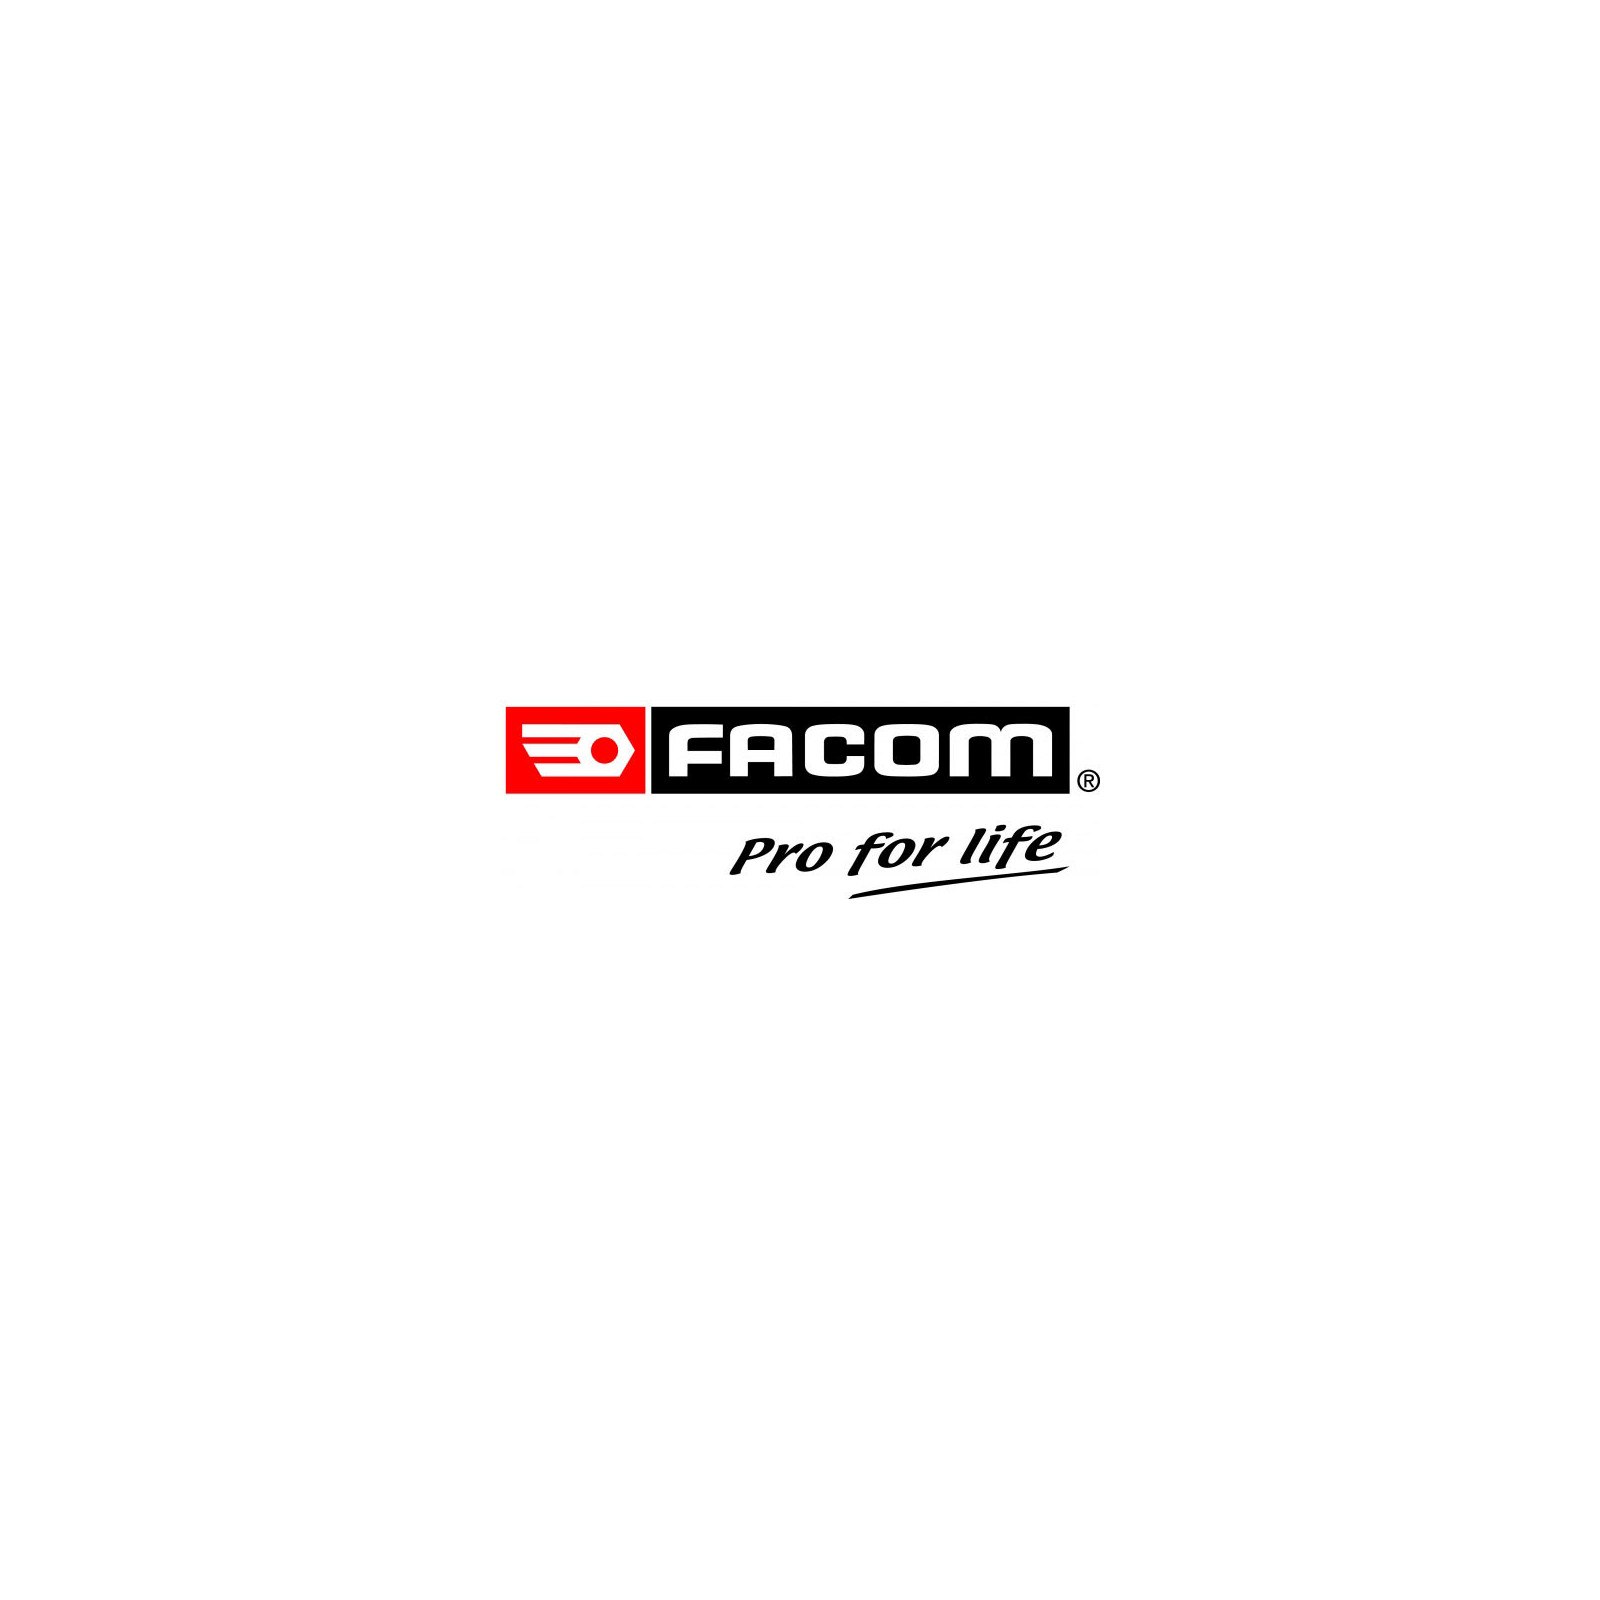 Ens.reparation - Facom 506.RN